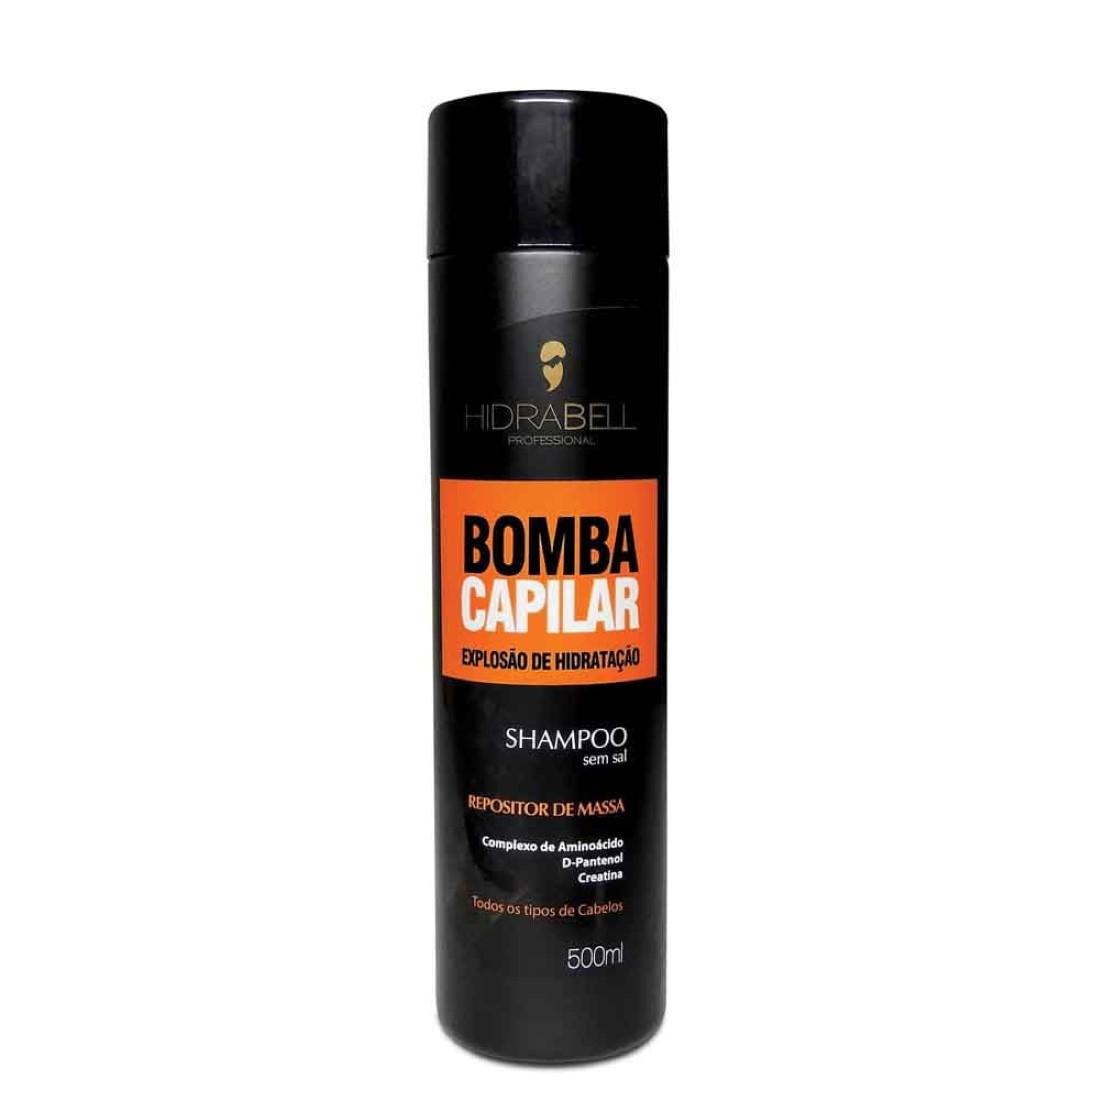 Shampoo Bomba Capilar Repositor de Massa 500ml - Hidrabell